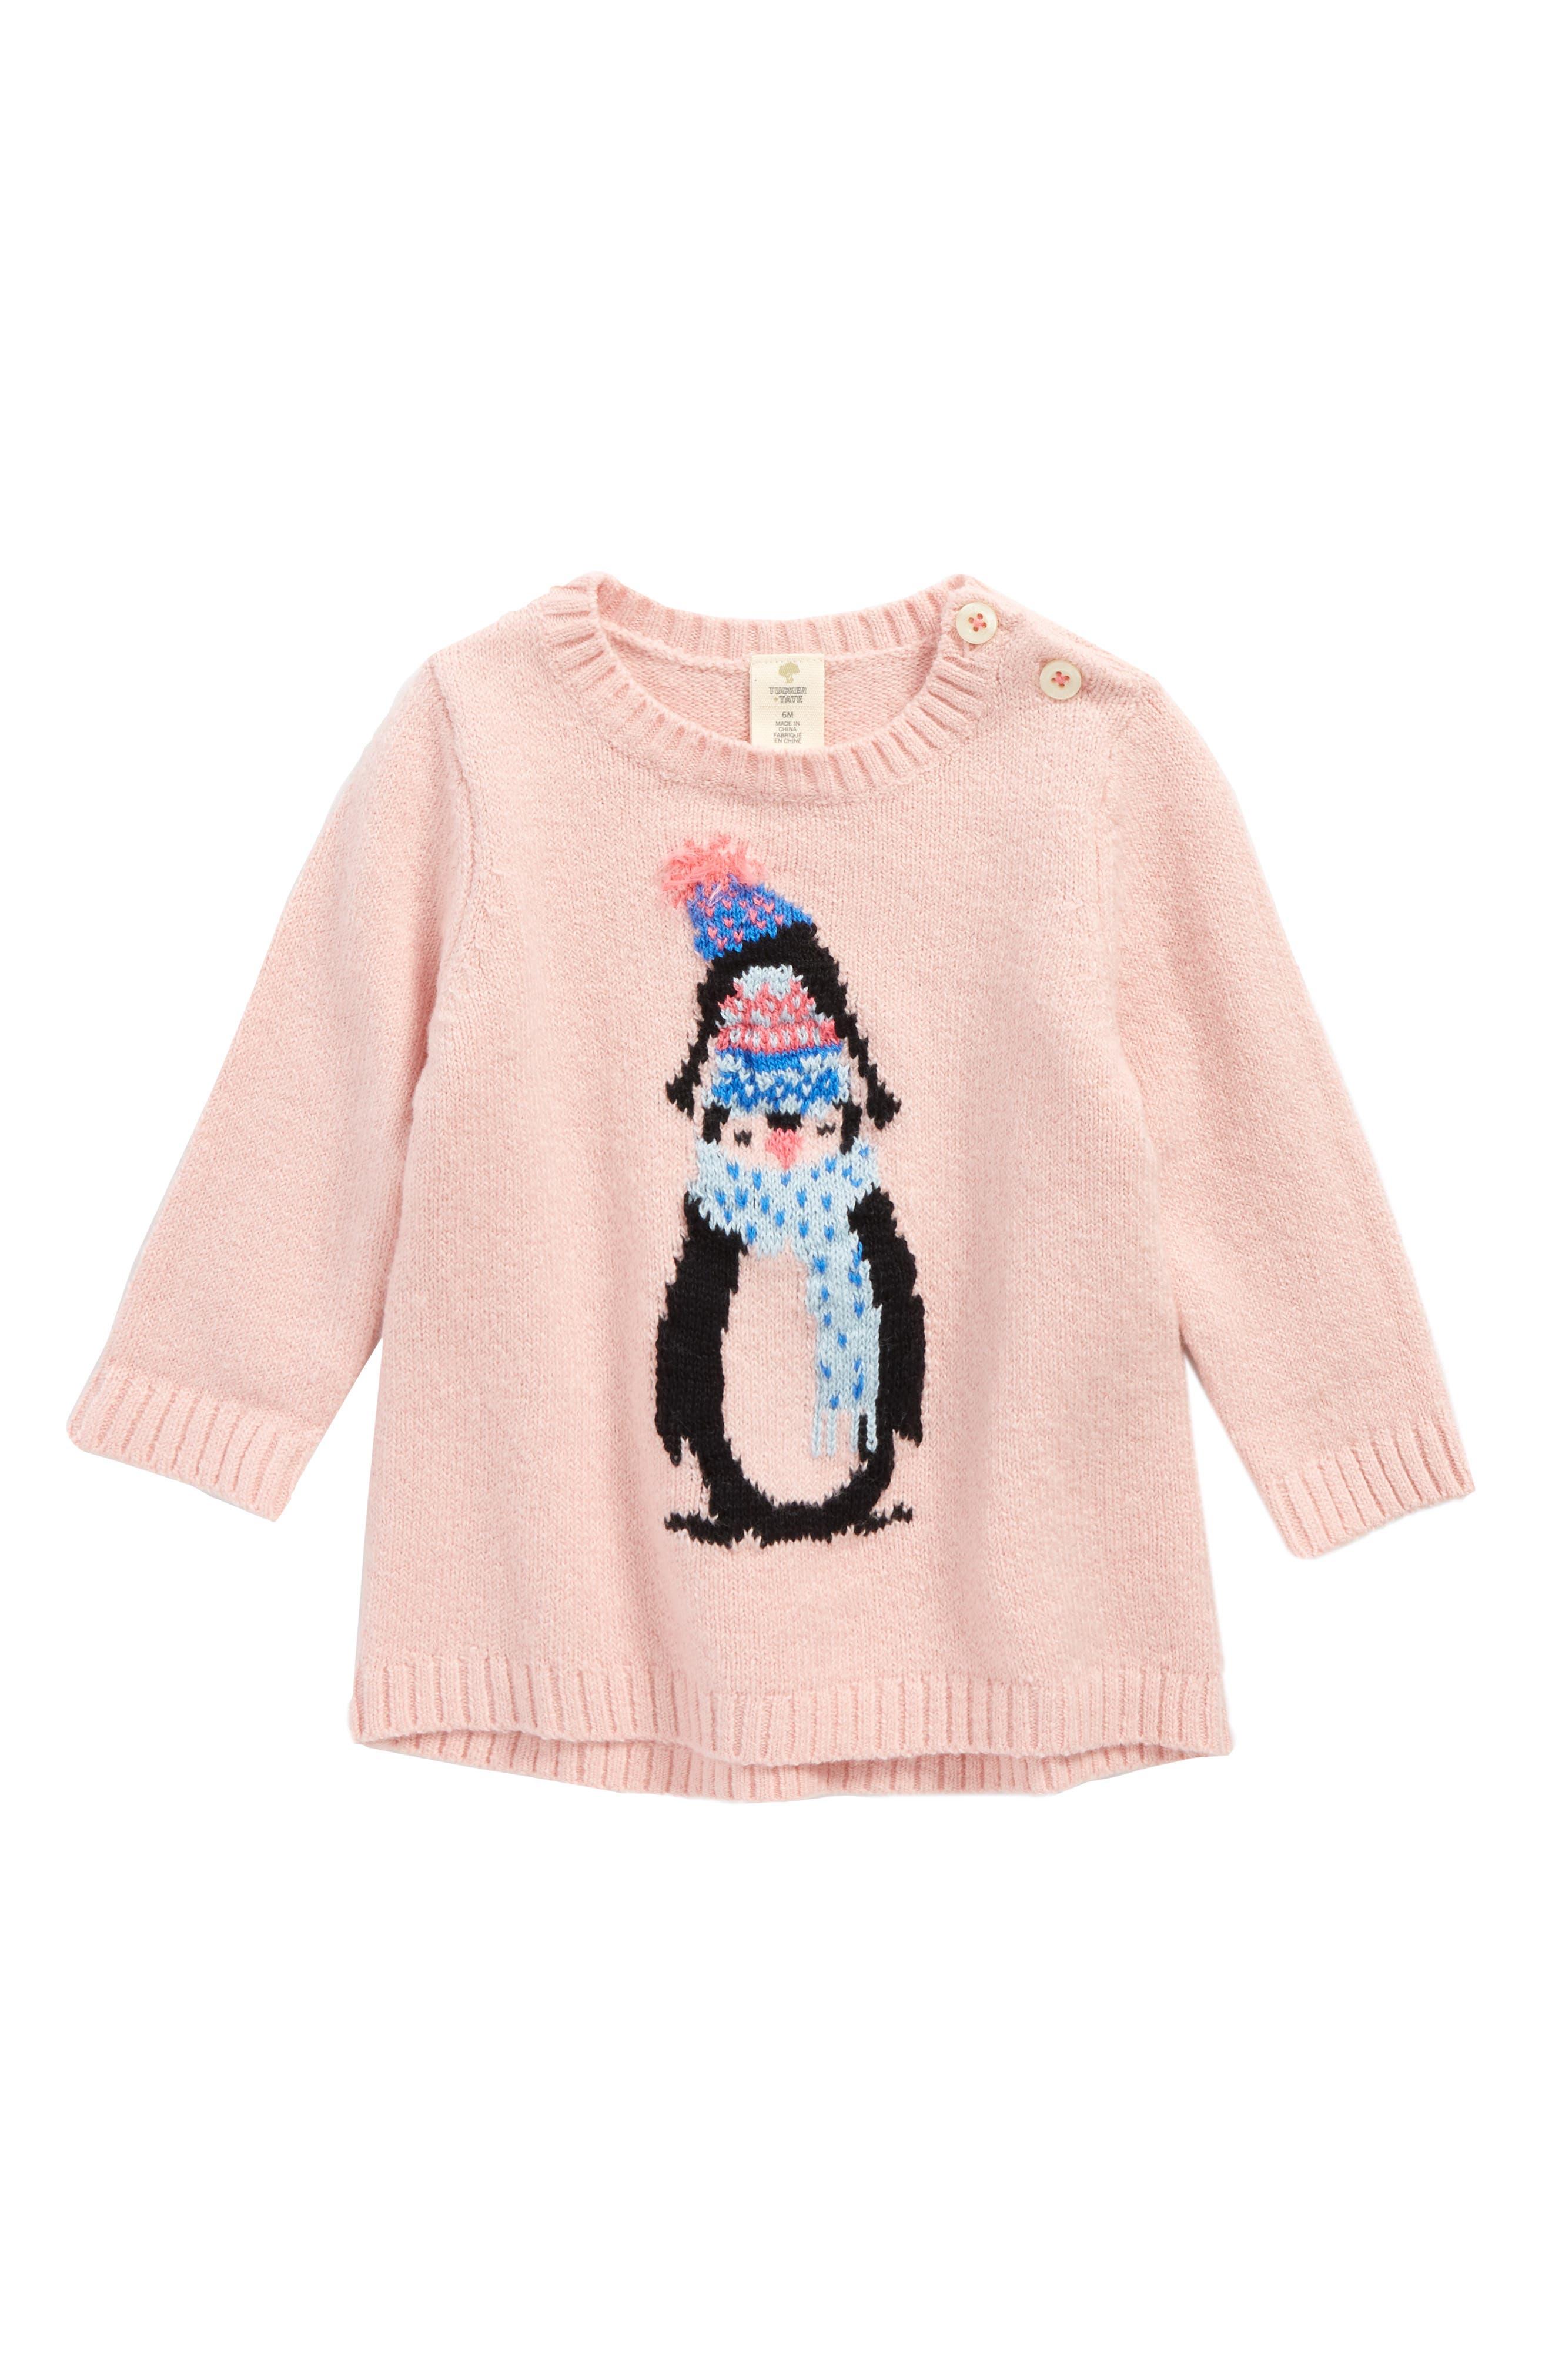 Penguin Sweater,                         Main,                         color, Pink Silver Penguin